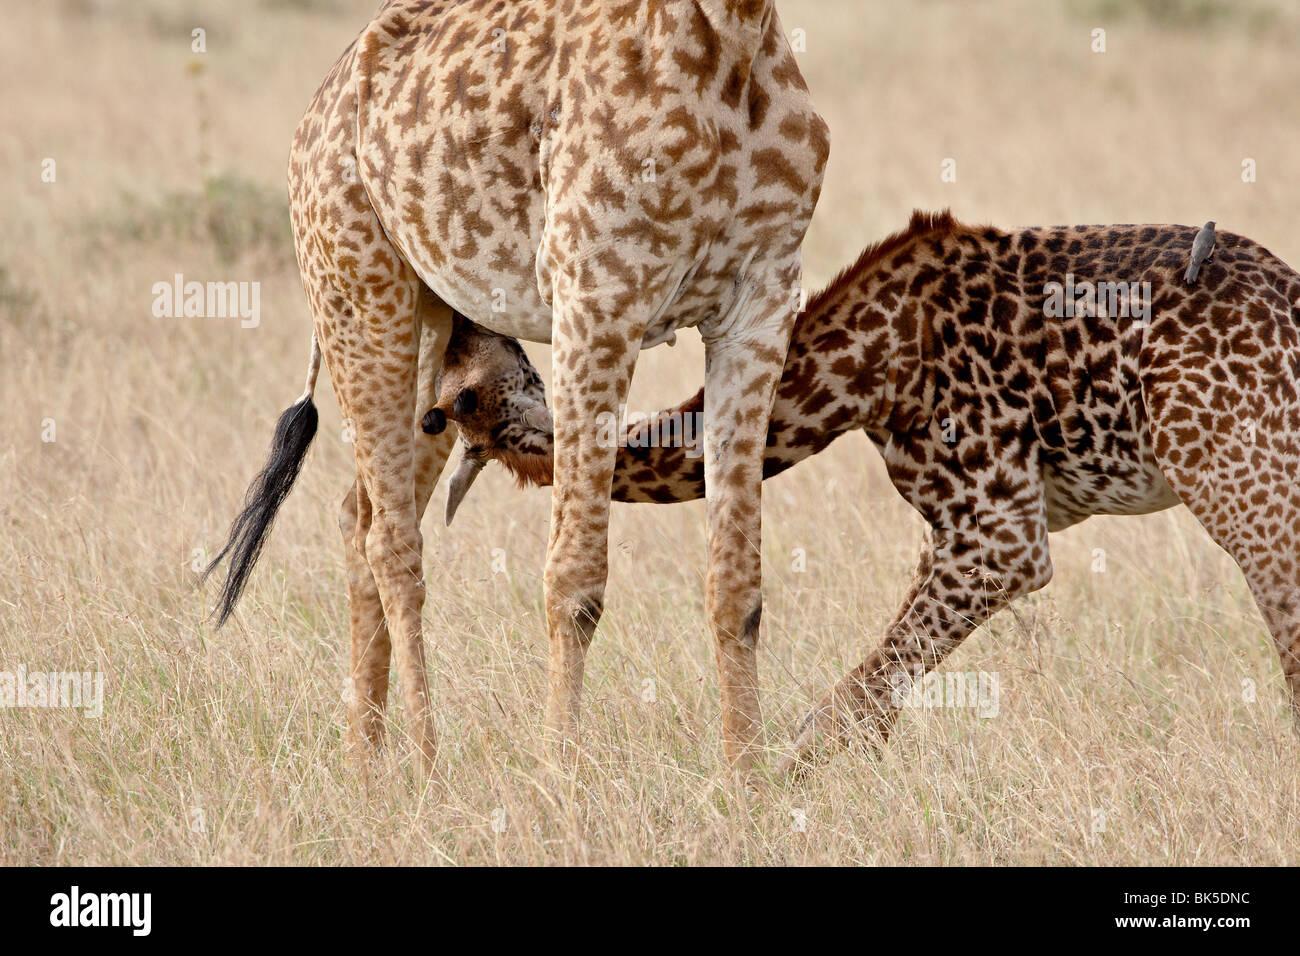 Masai bébé Girafe (Giraffa camelopardalis tippelskirchi) soins infirmiers, Masai Mara National Reserve, Photo Stock